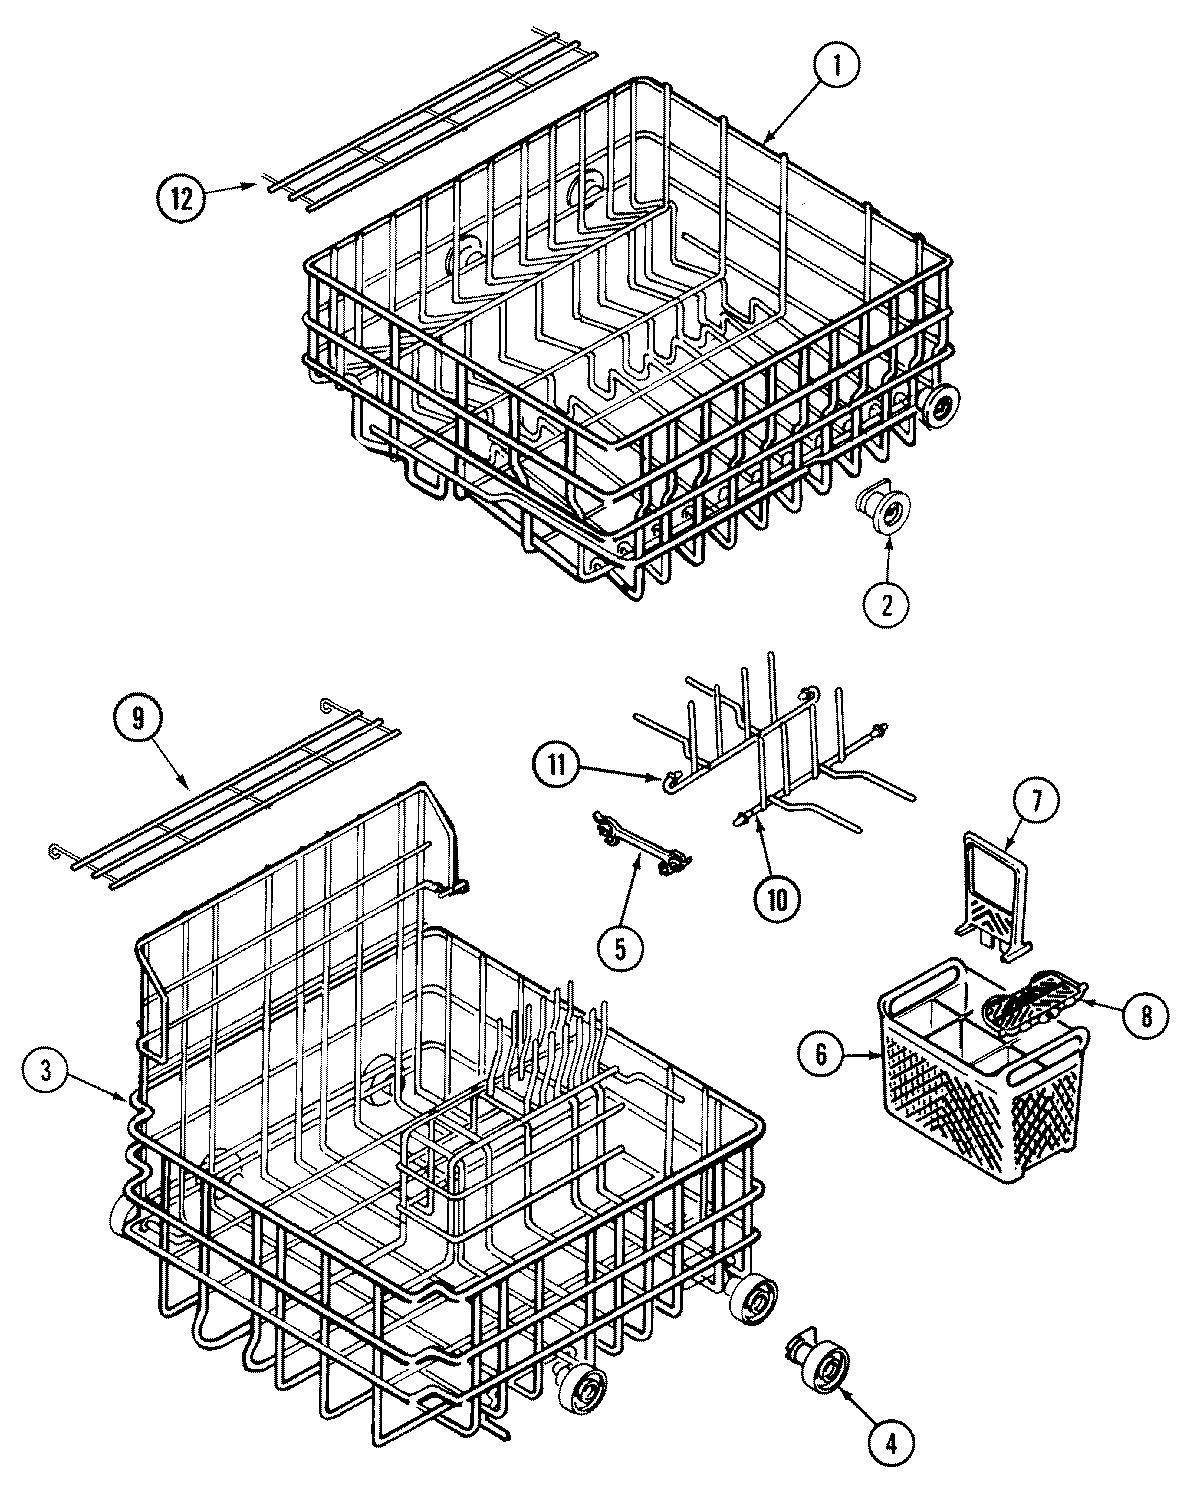 RACKS Diagram & Parts List for Model dwu9906aax Maytag